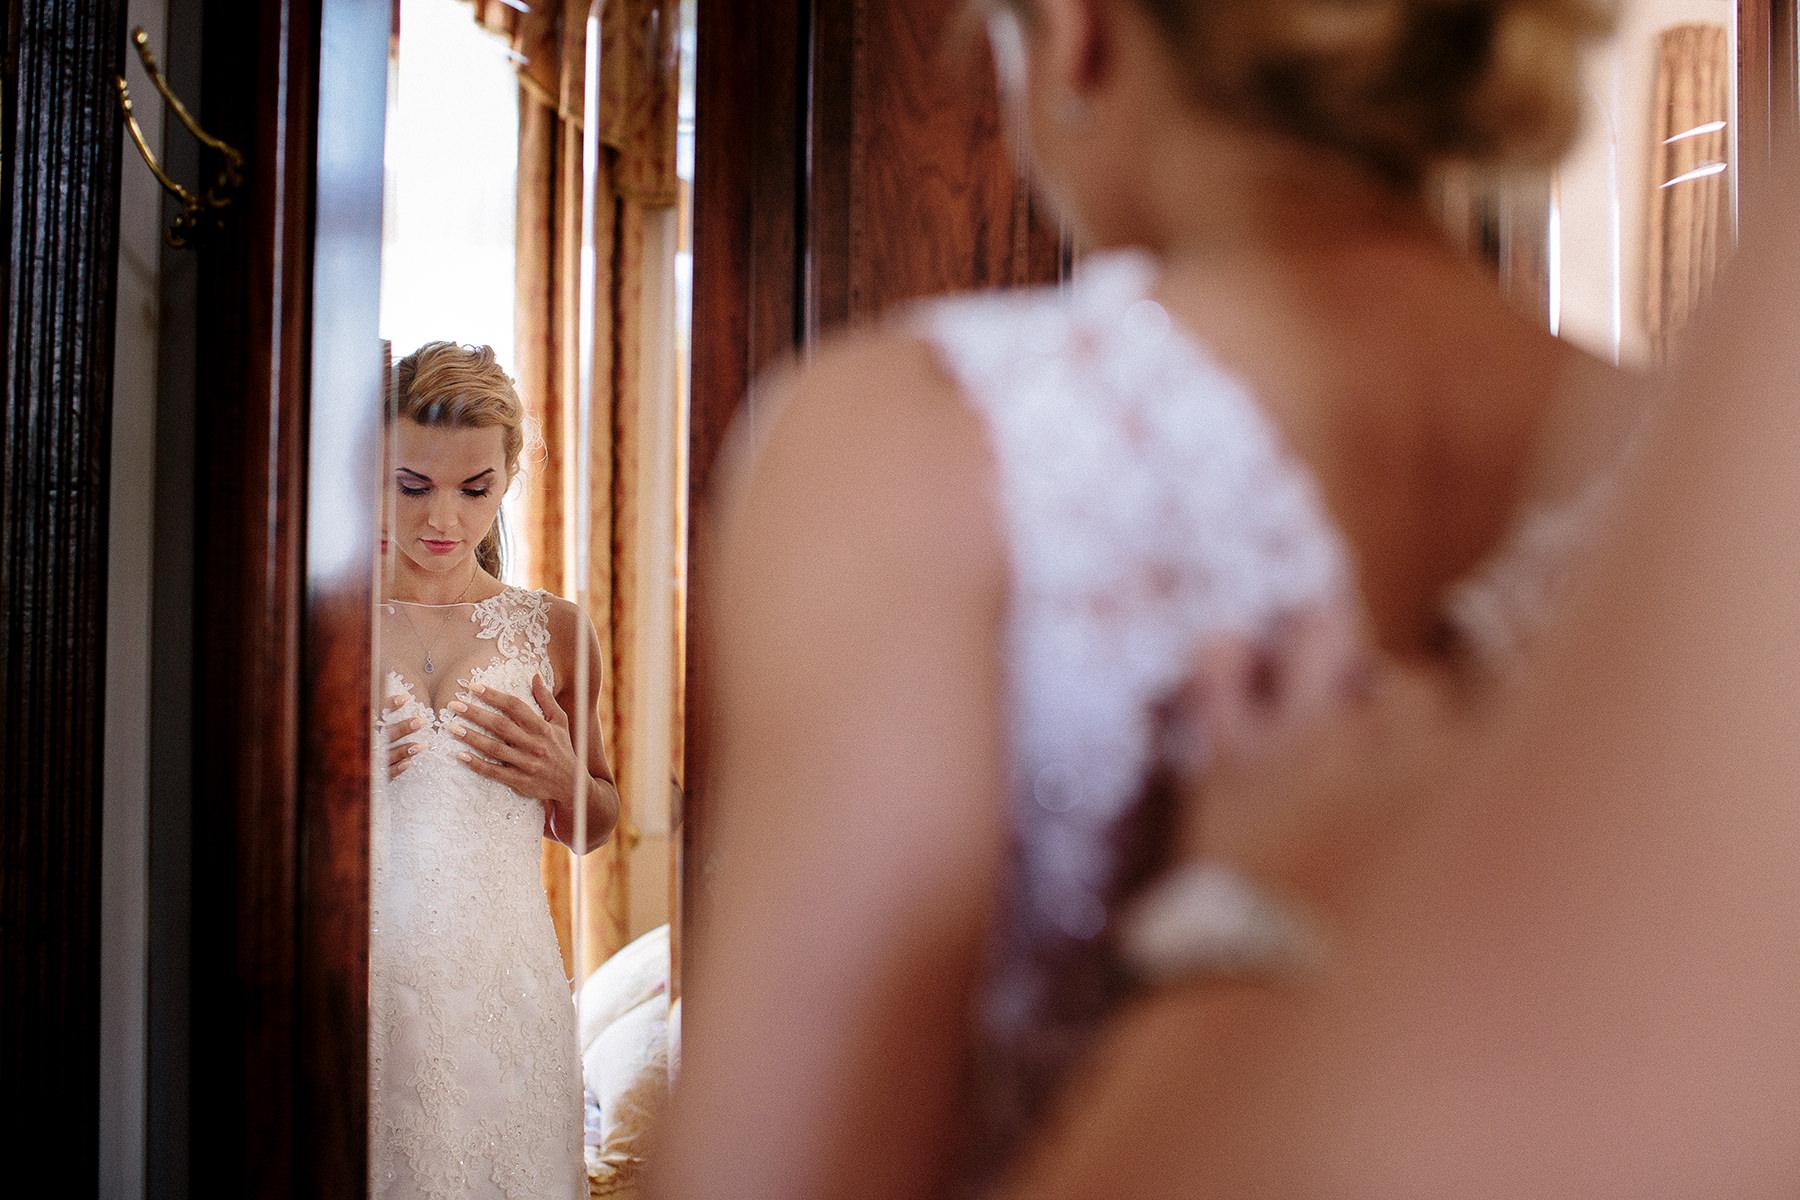 bride getting ready, palace wedding preparations